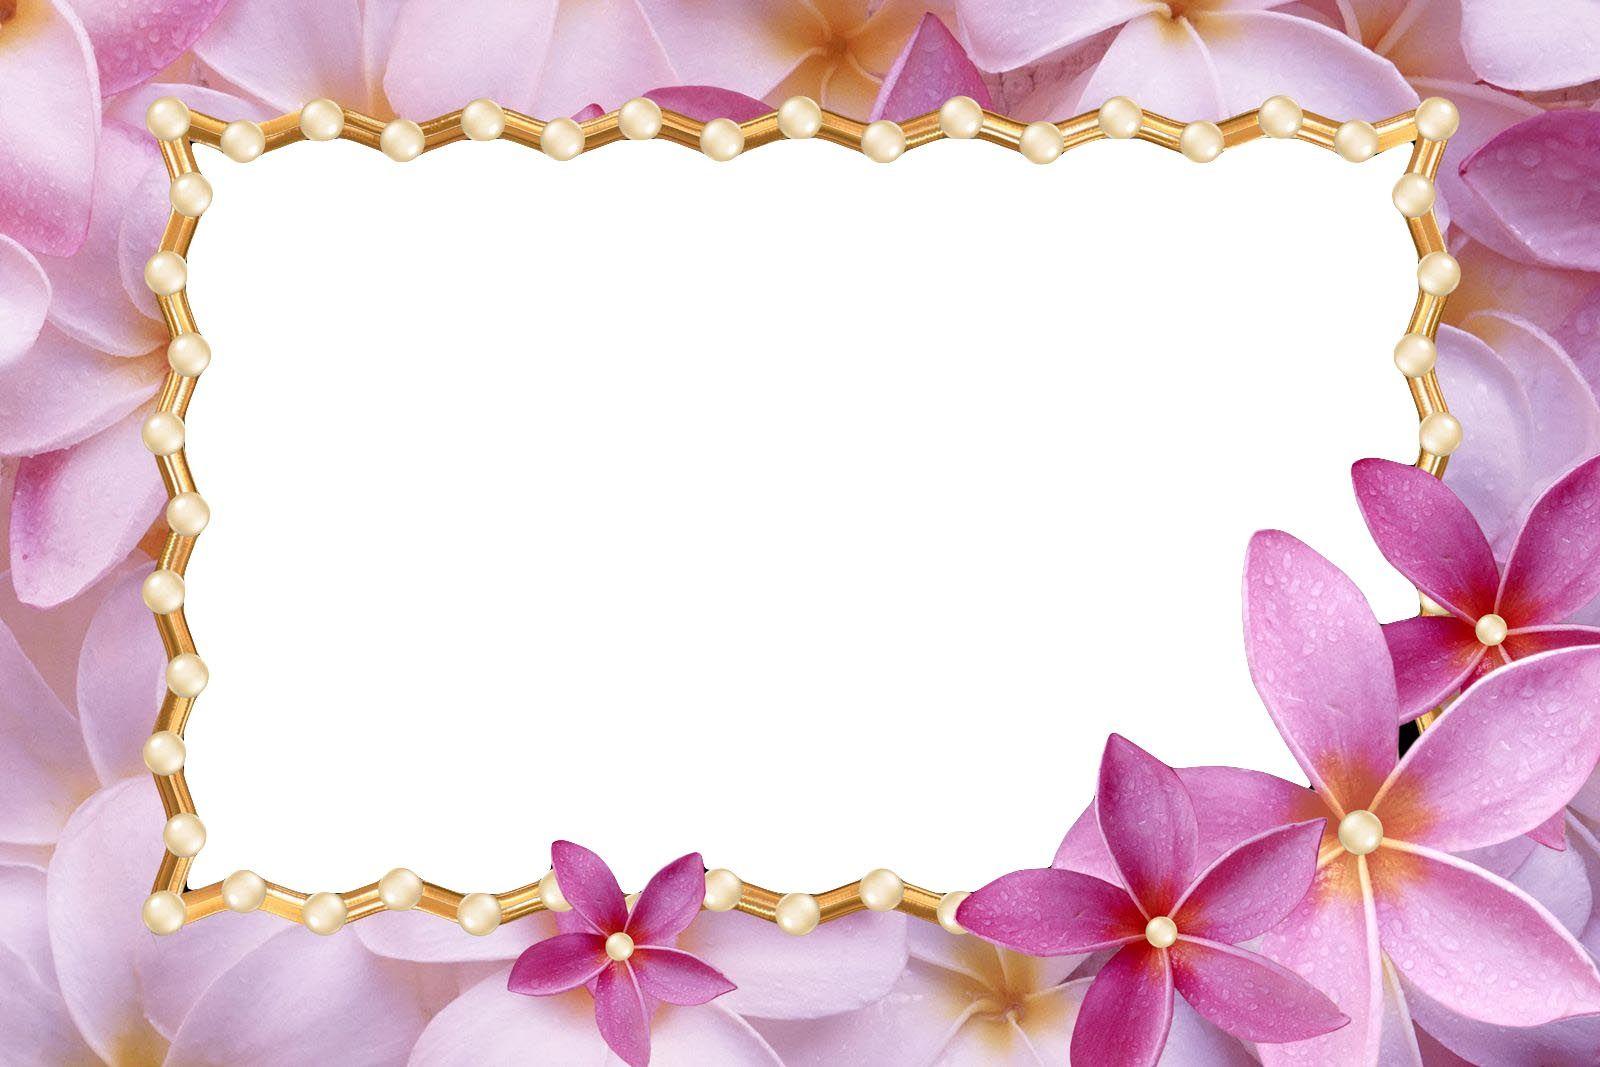 Frame Love Background Png | Nakanak org